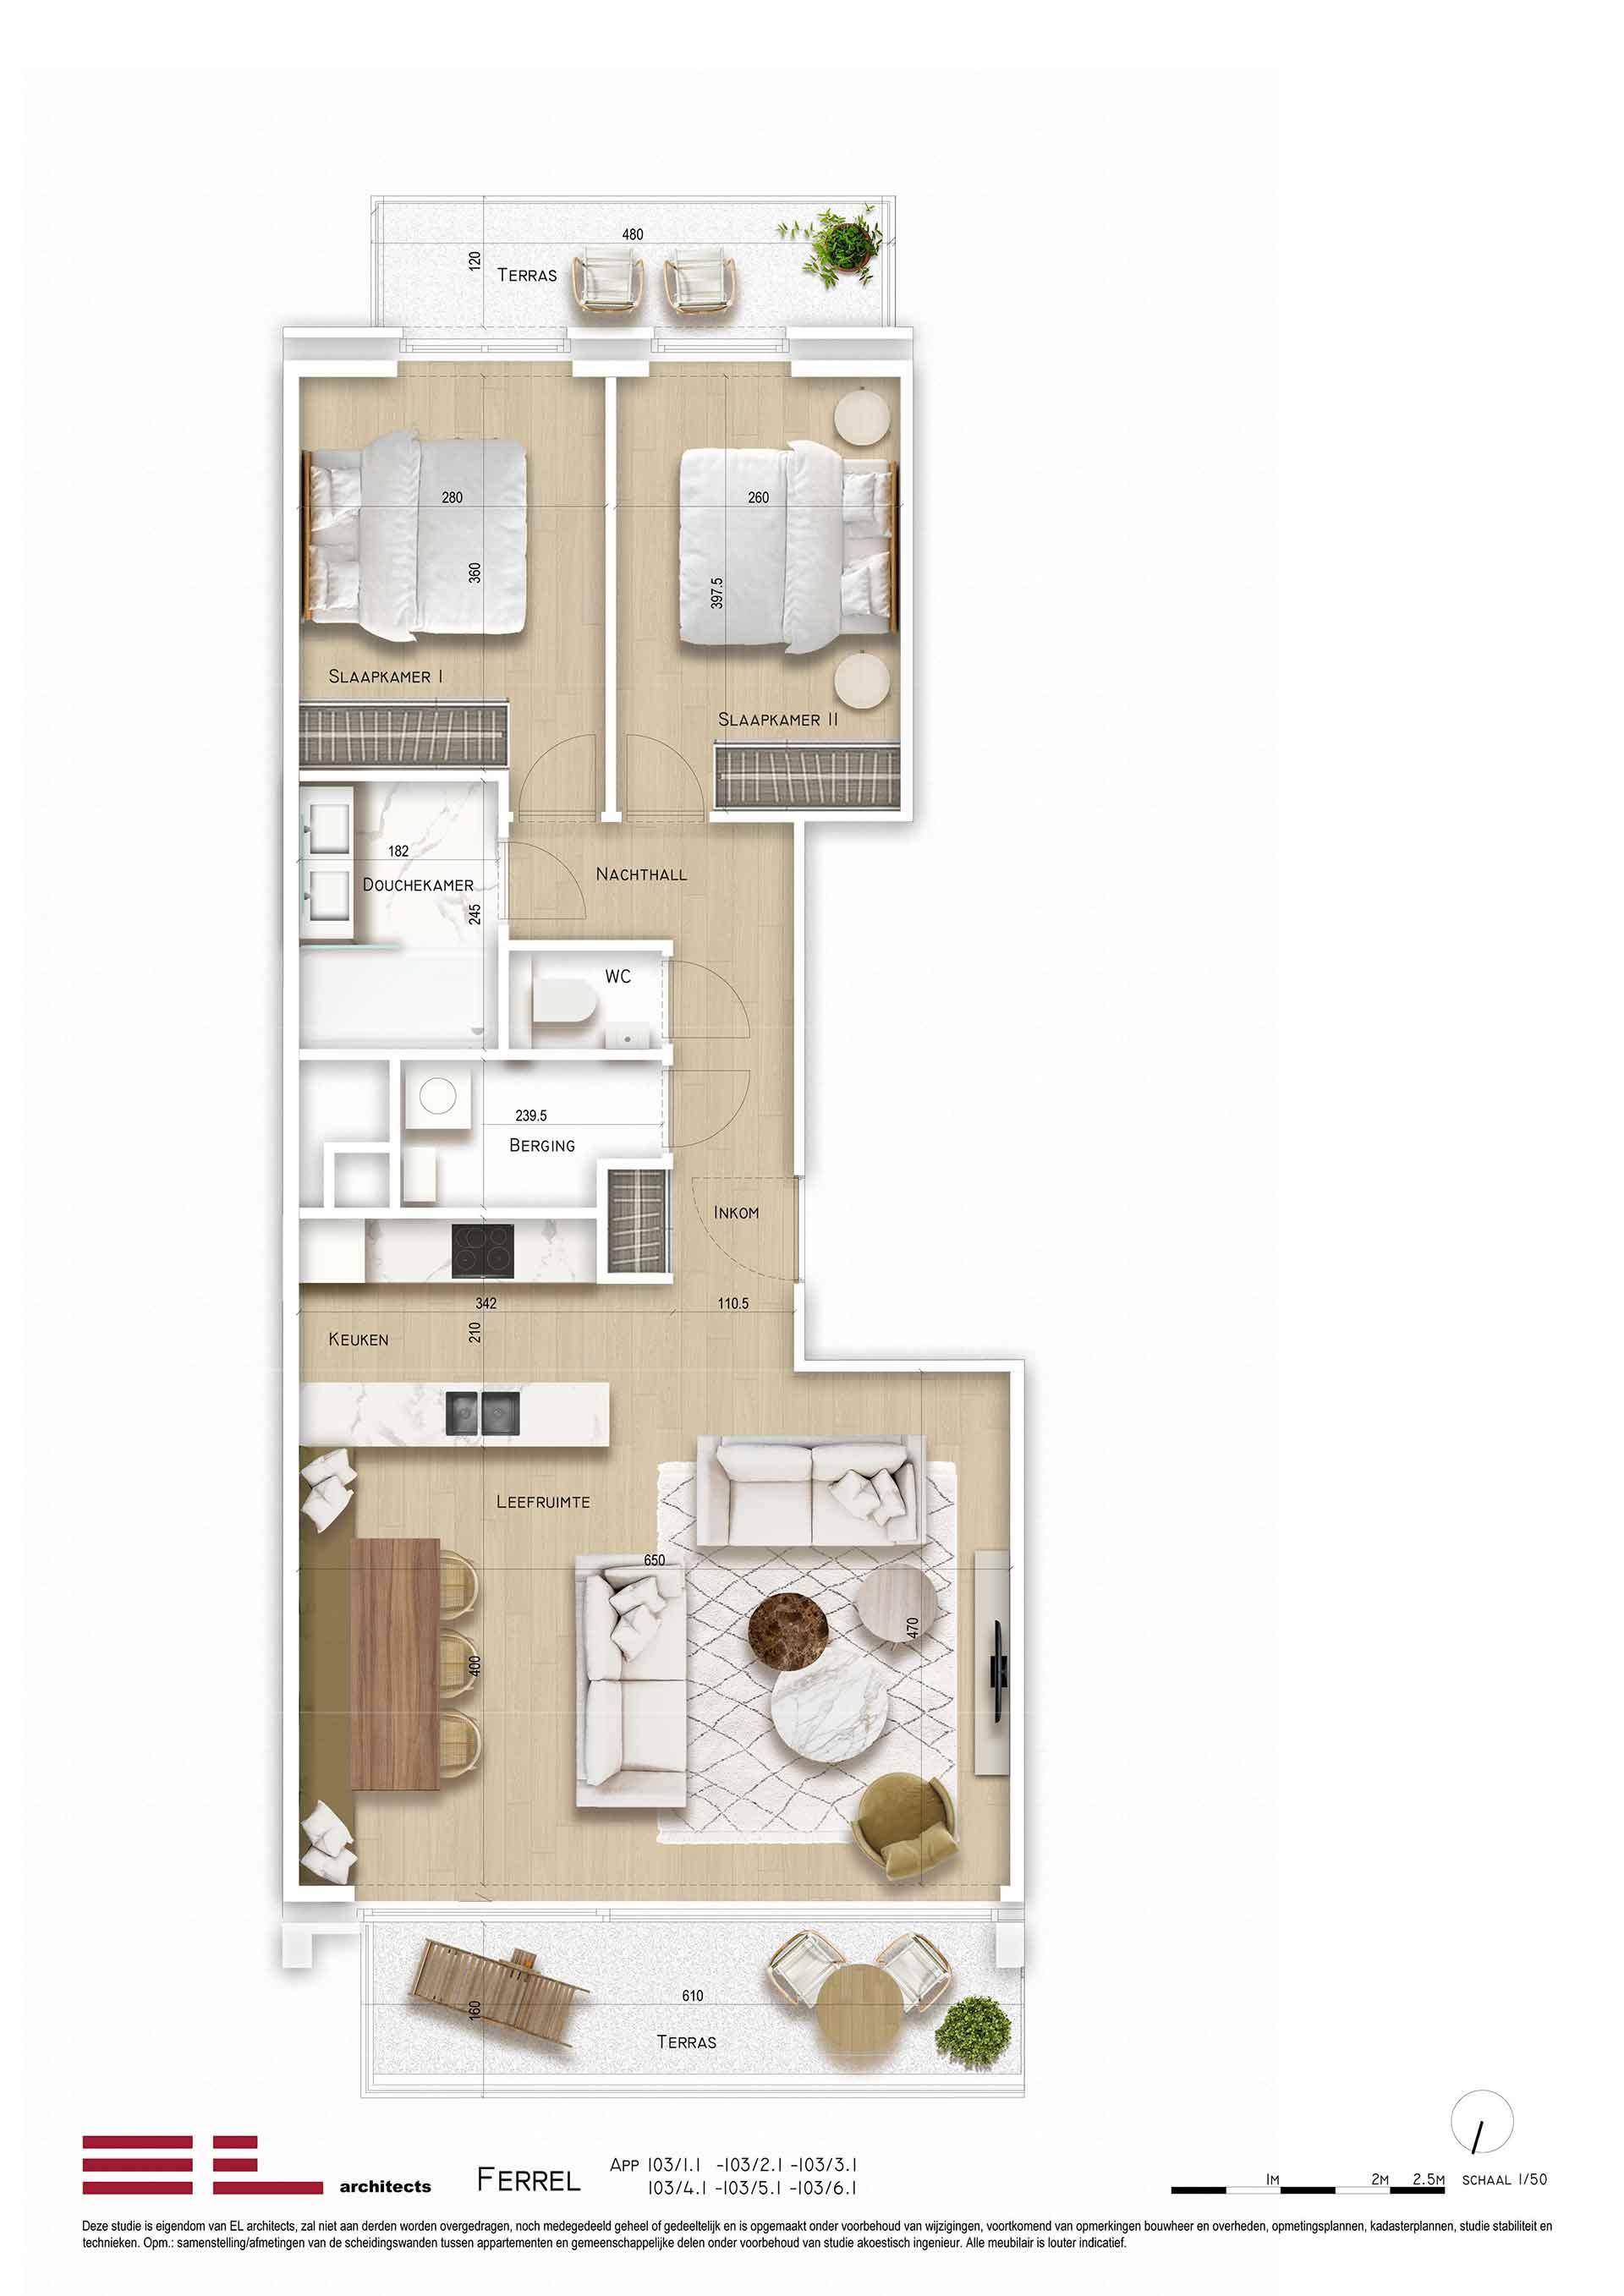 Residentie <br/> Ferrel - image appartement-te-koop-sint-idesbald-residentie-ferrel-appartement-type1 on https://hoprom.be